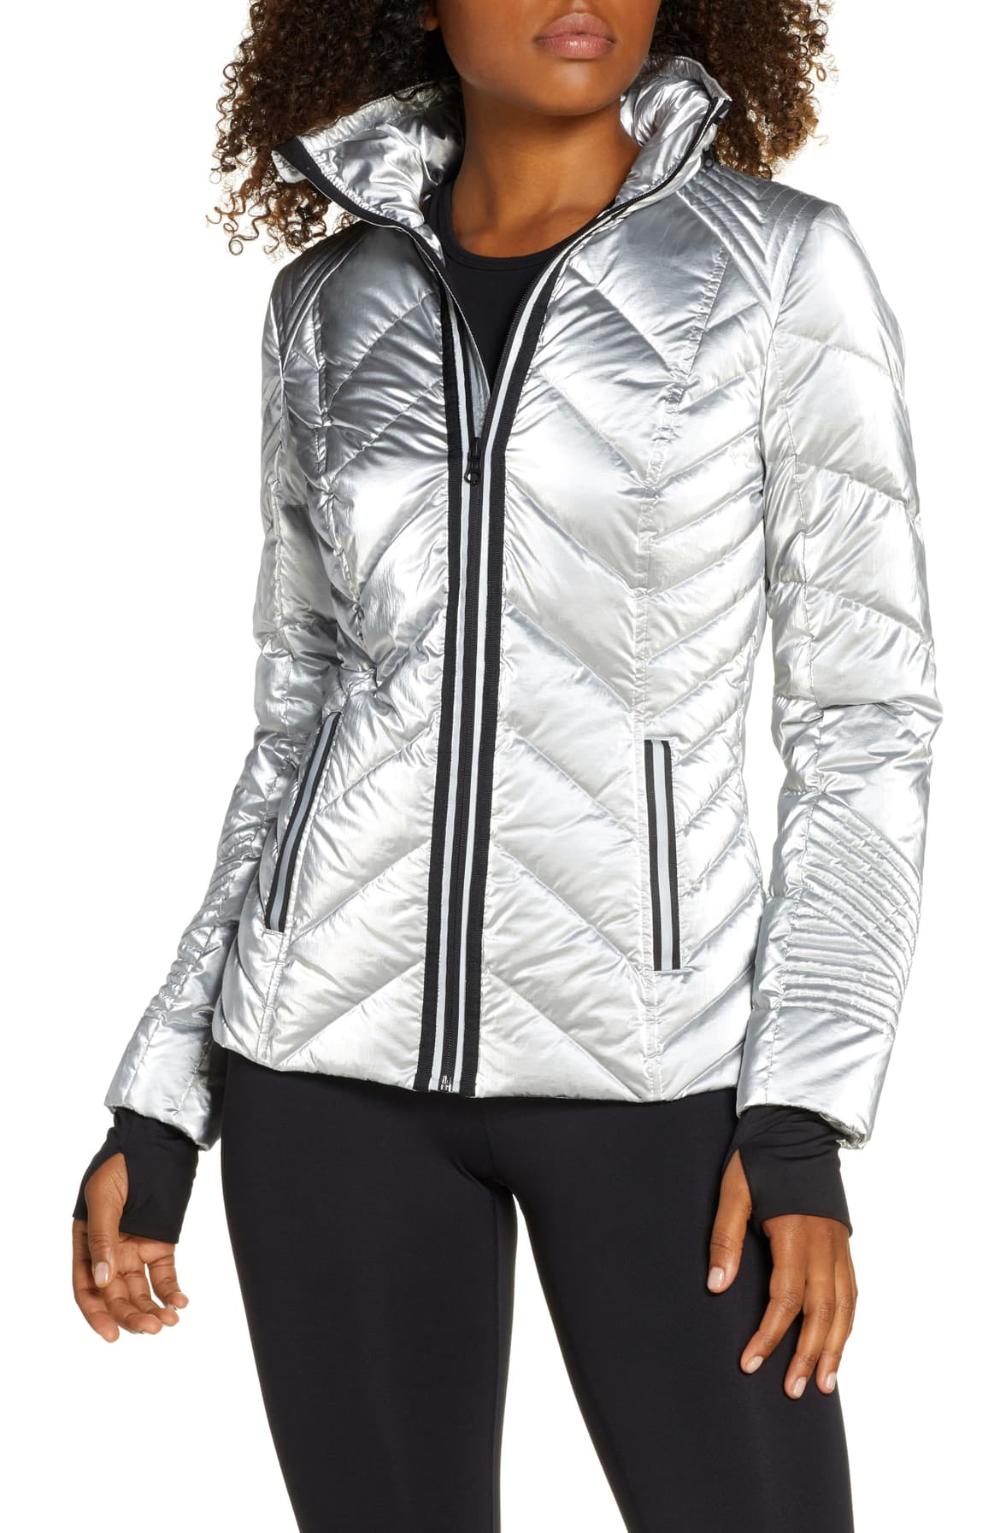 Blanc Noir Reflective Down Puffer Jacket Nordstrom Sporty Jacket Jackets Puffer Jackets [ 1533 x 1000 Pixel ]